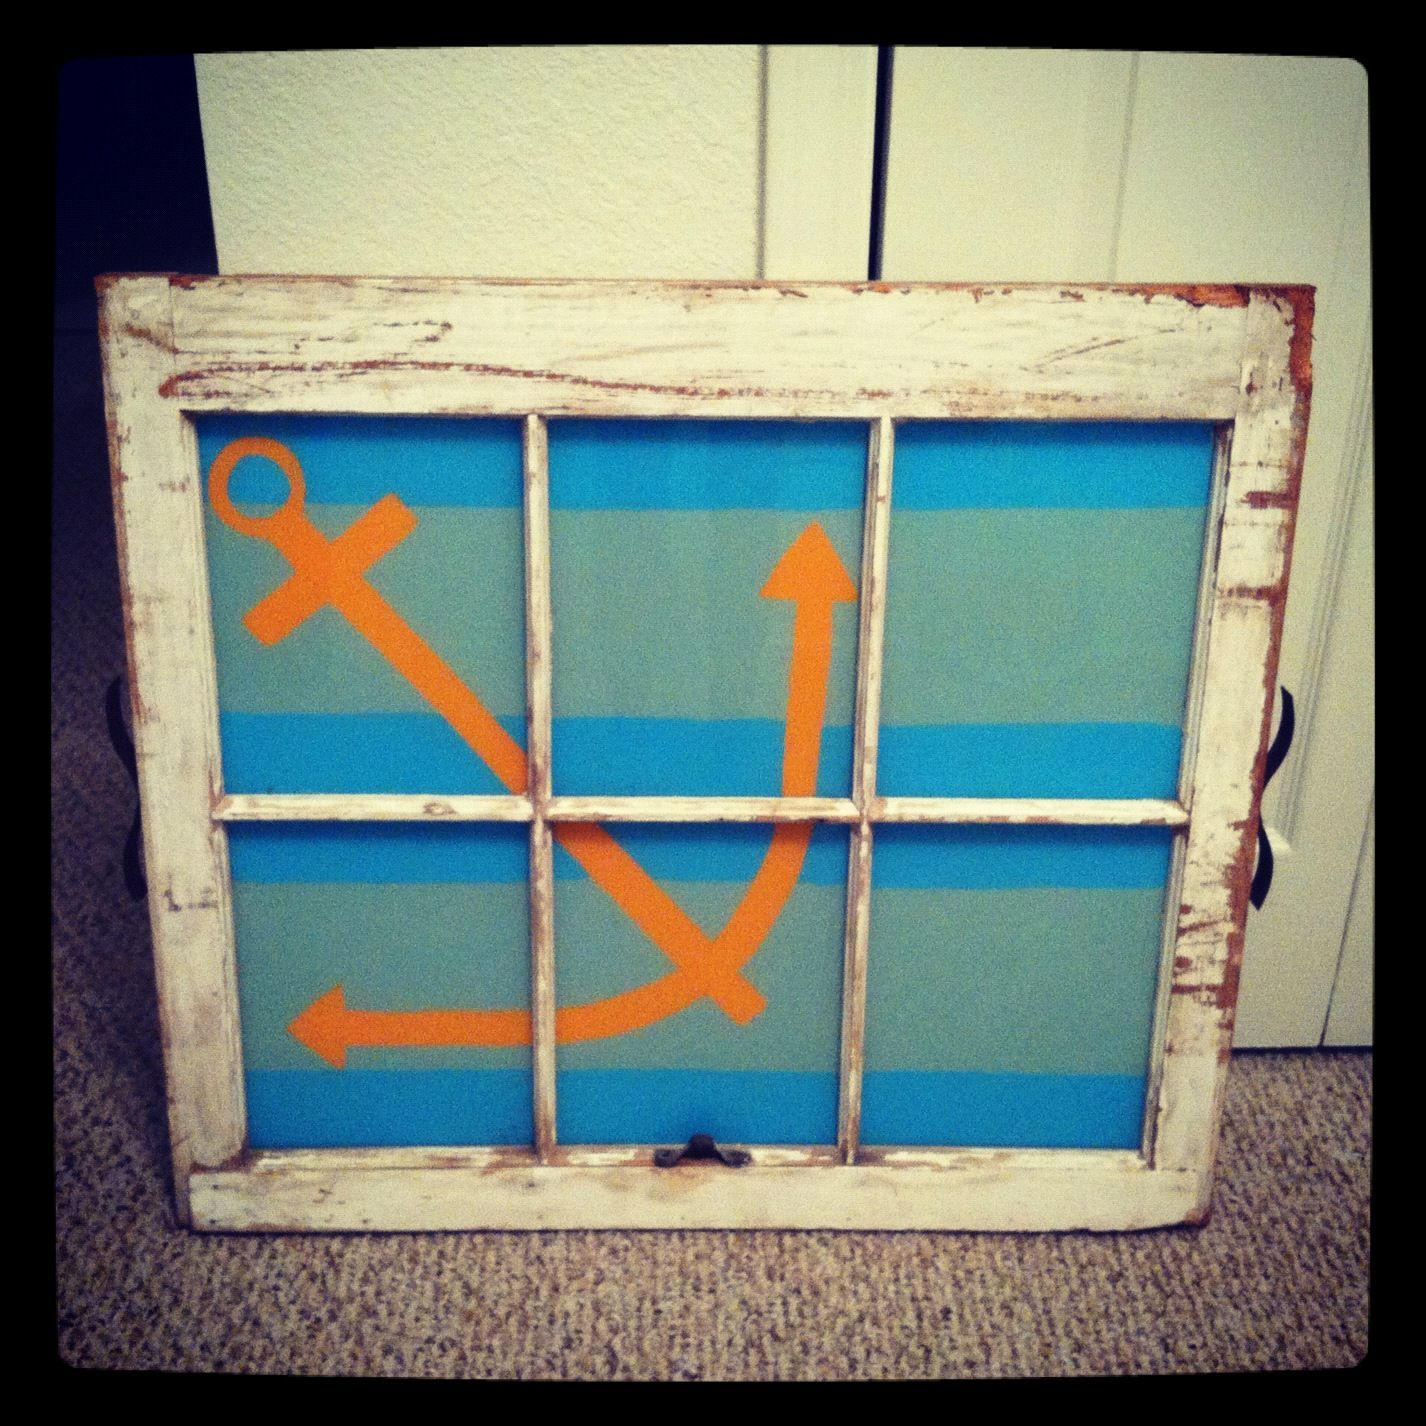 Window pane ideas  anchor painted window pane  painting ideas  pinterest  window